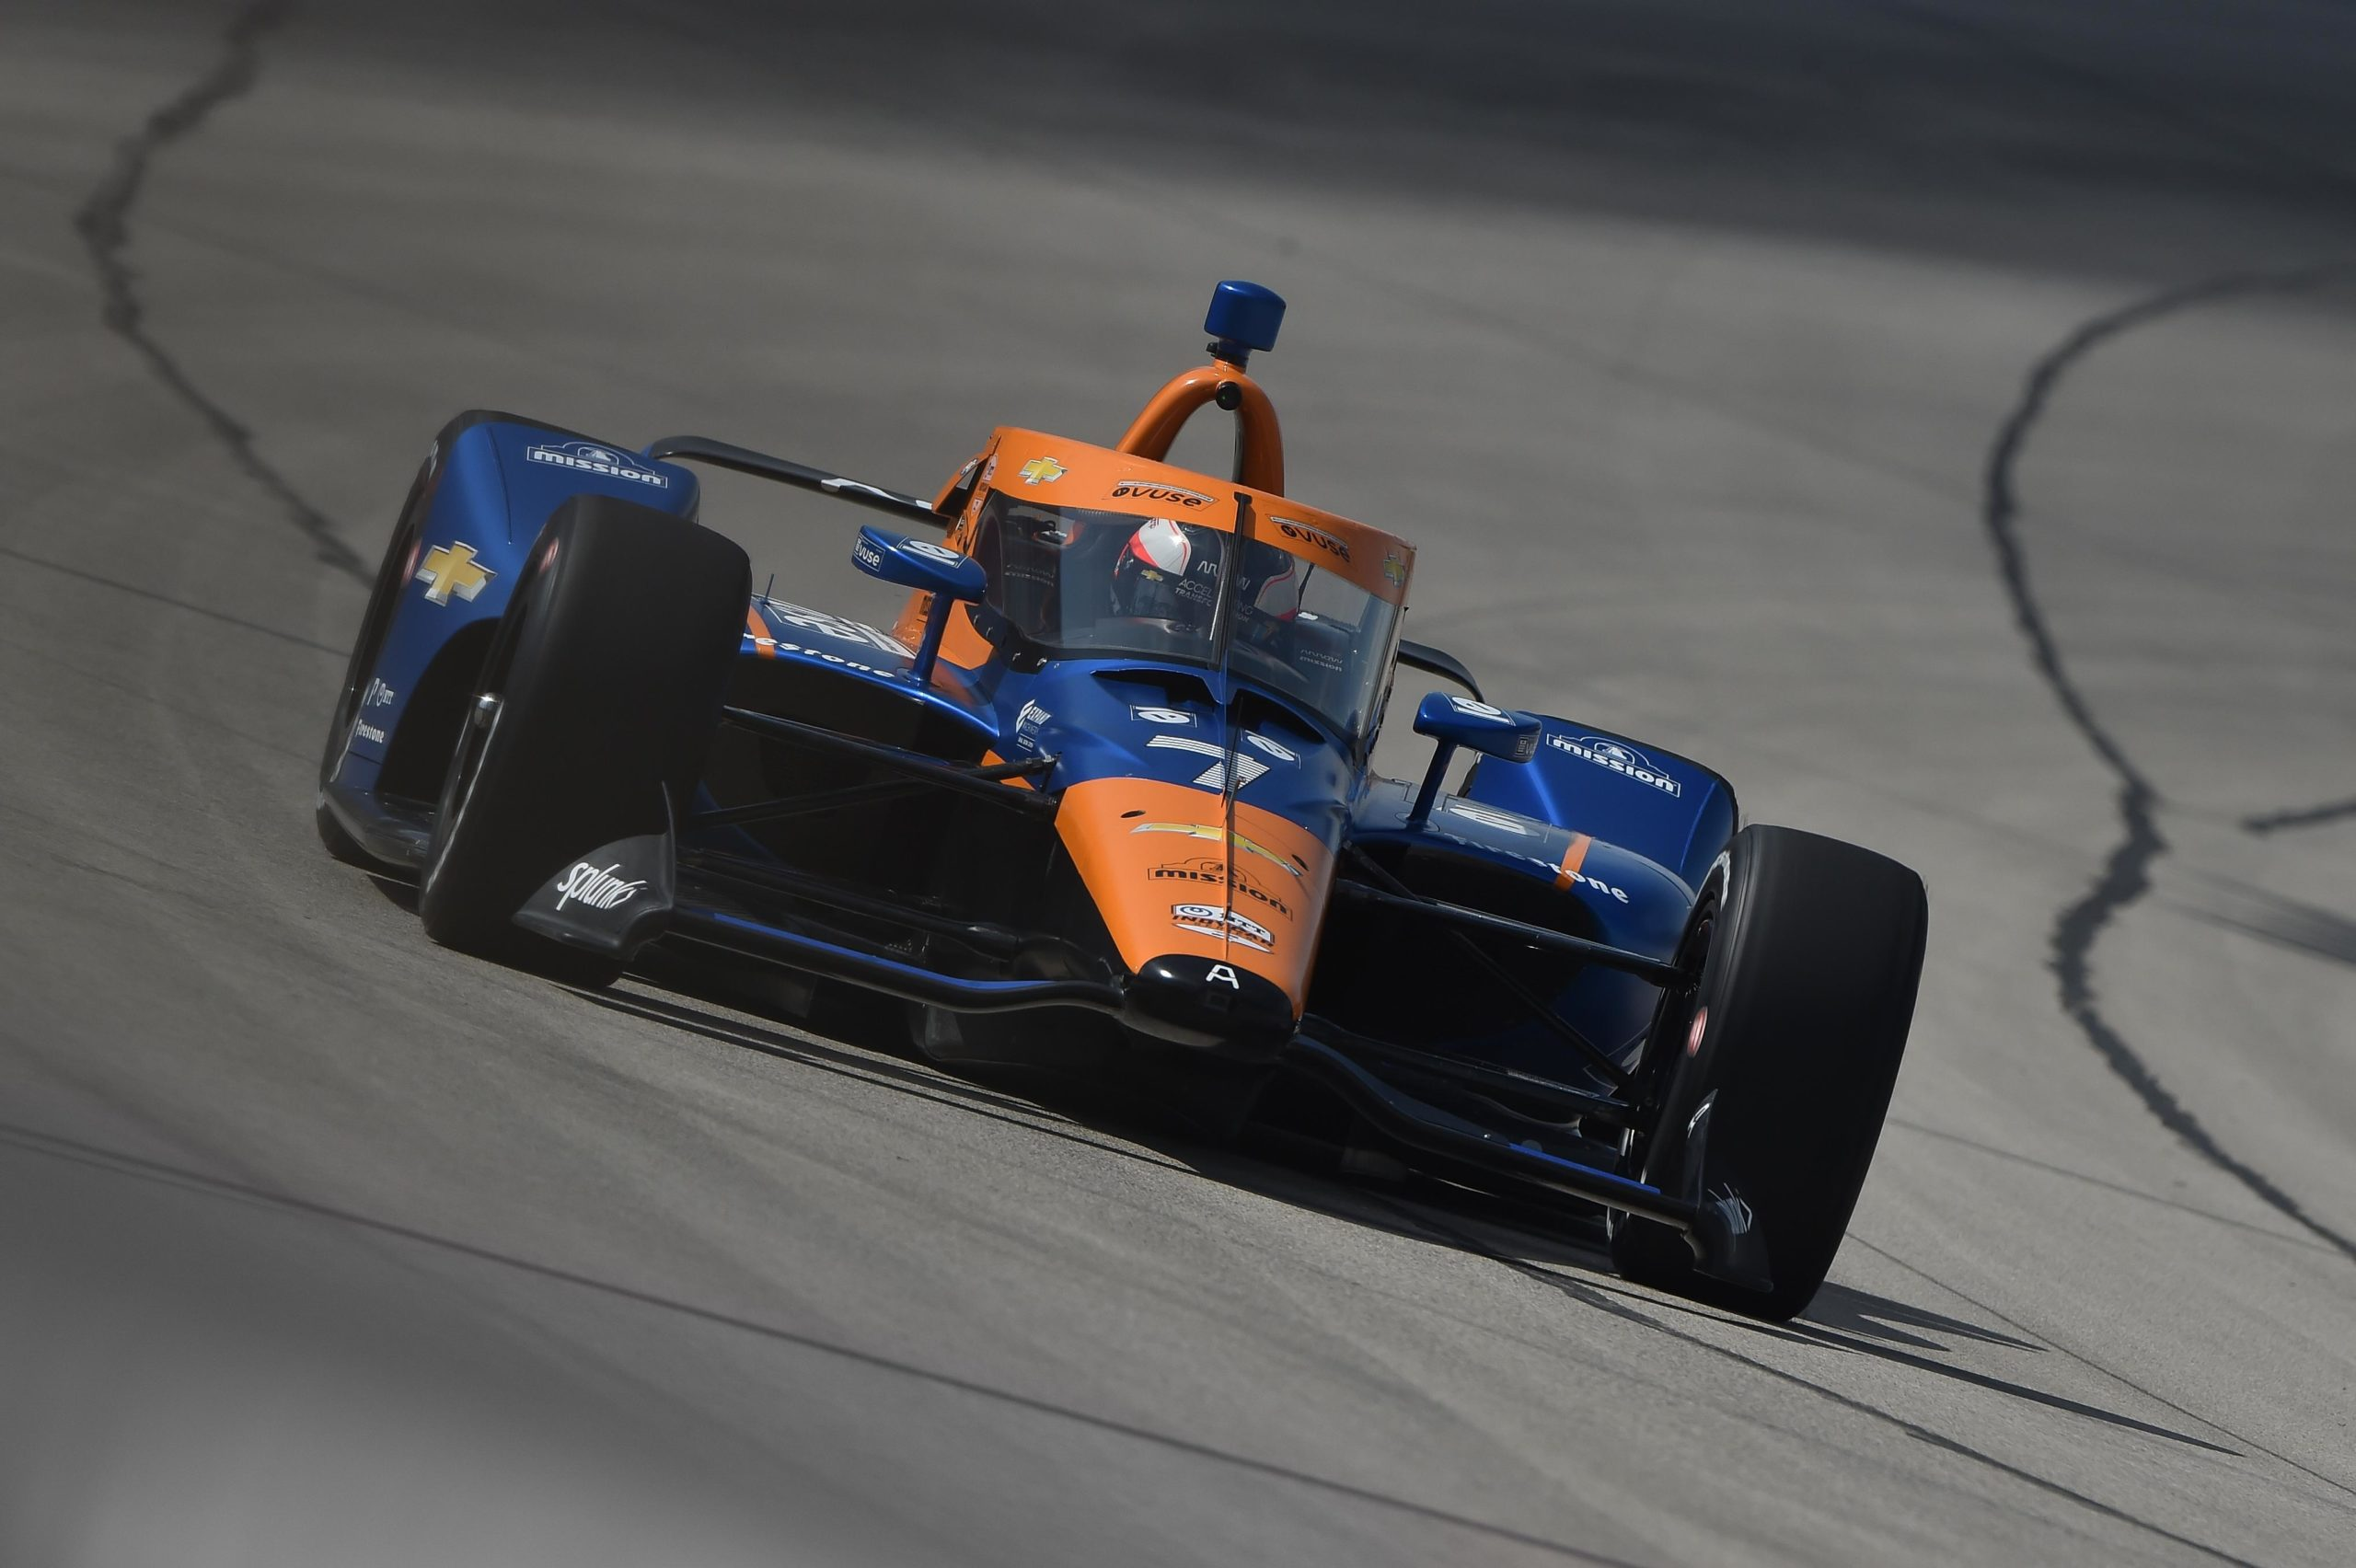 2021 NTT IndyCar Series Season Preview, Pt. 3